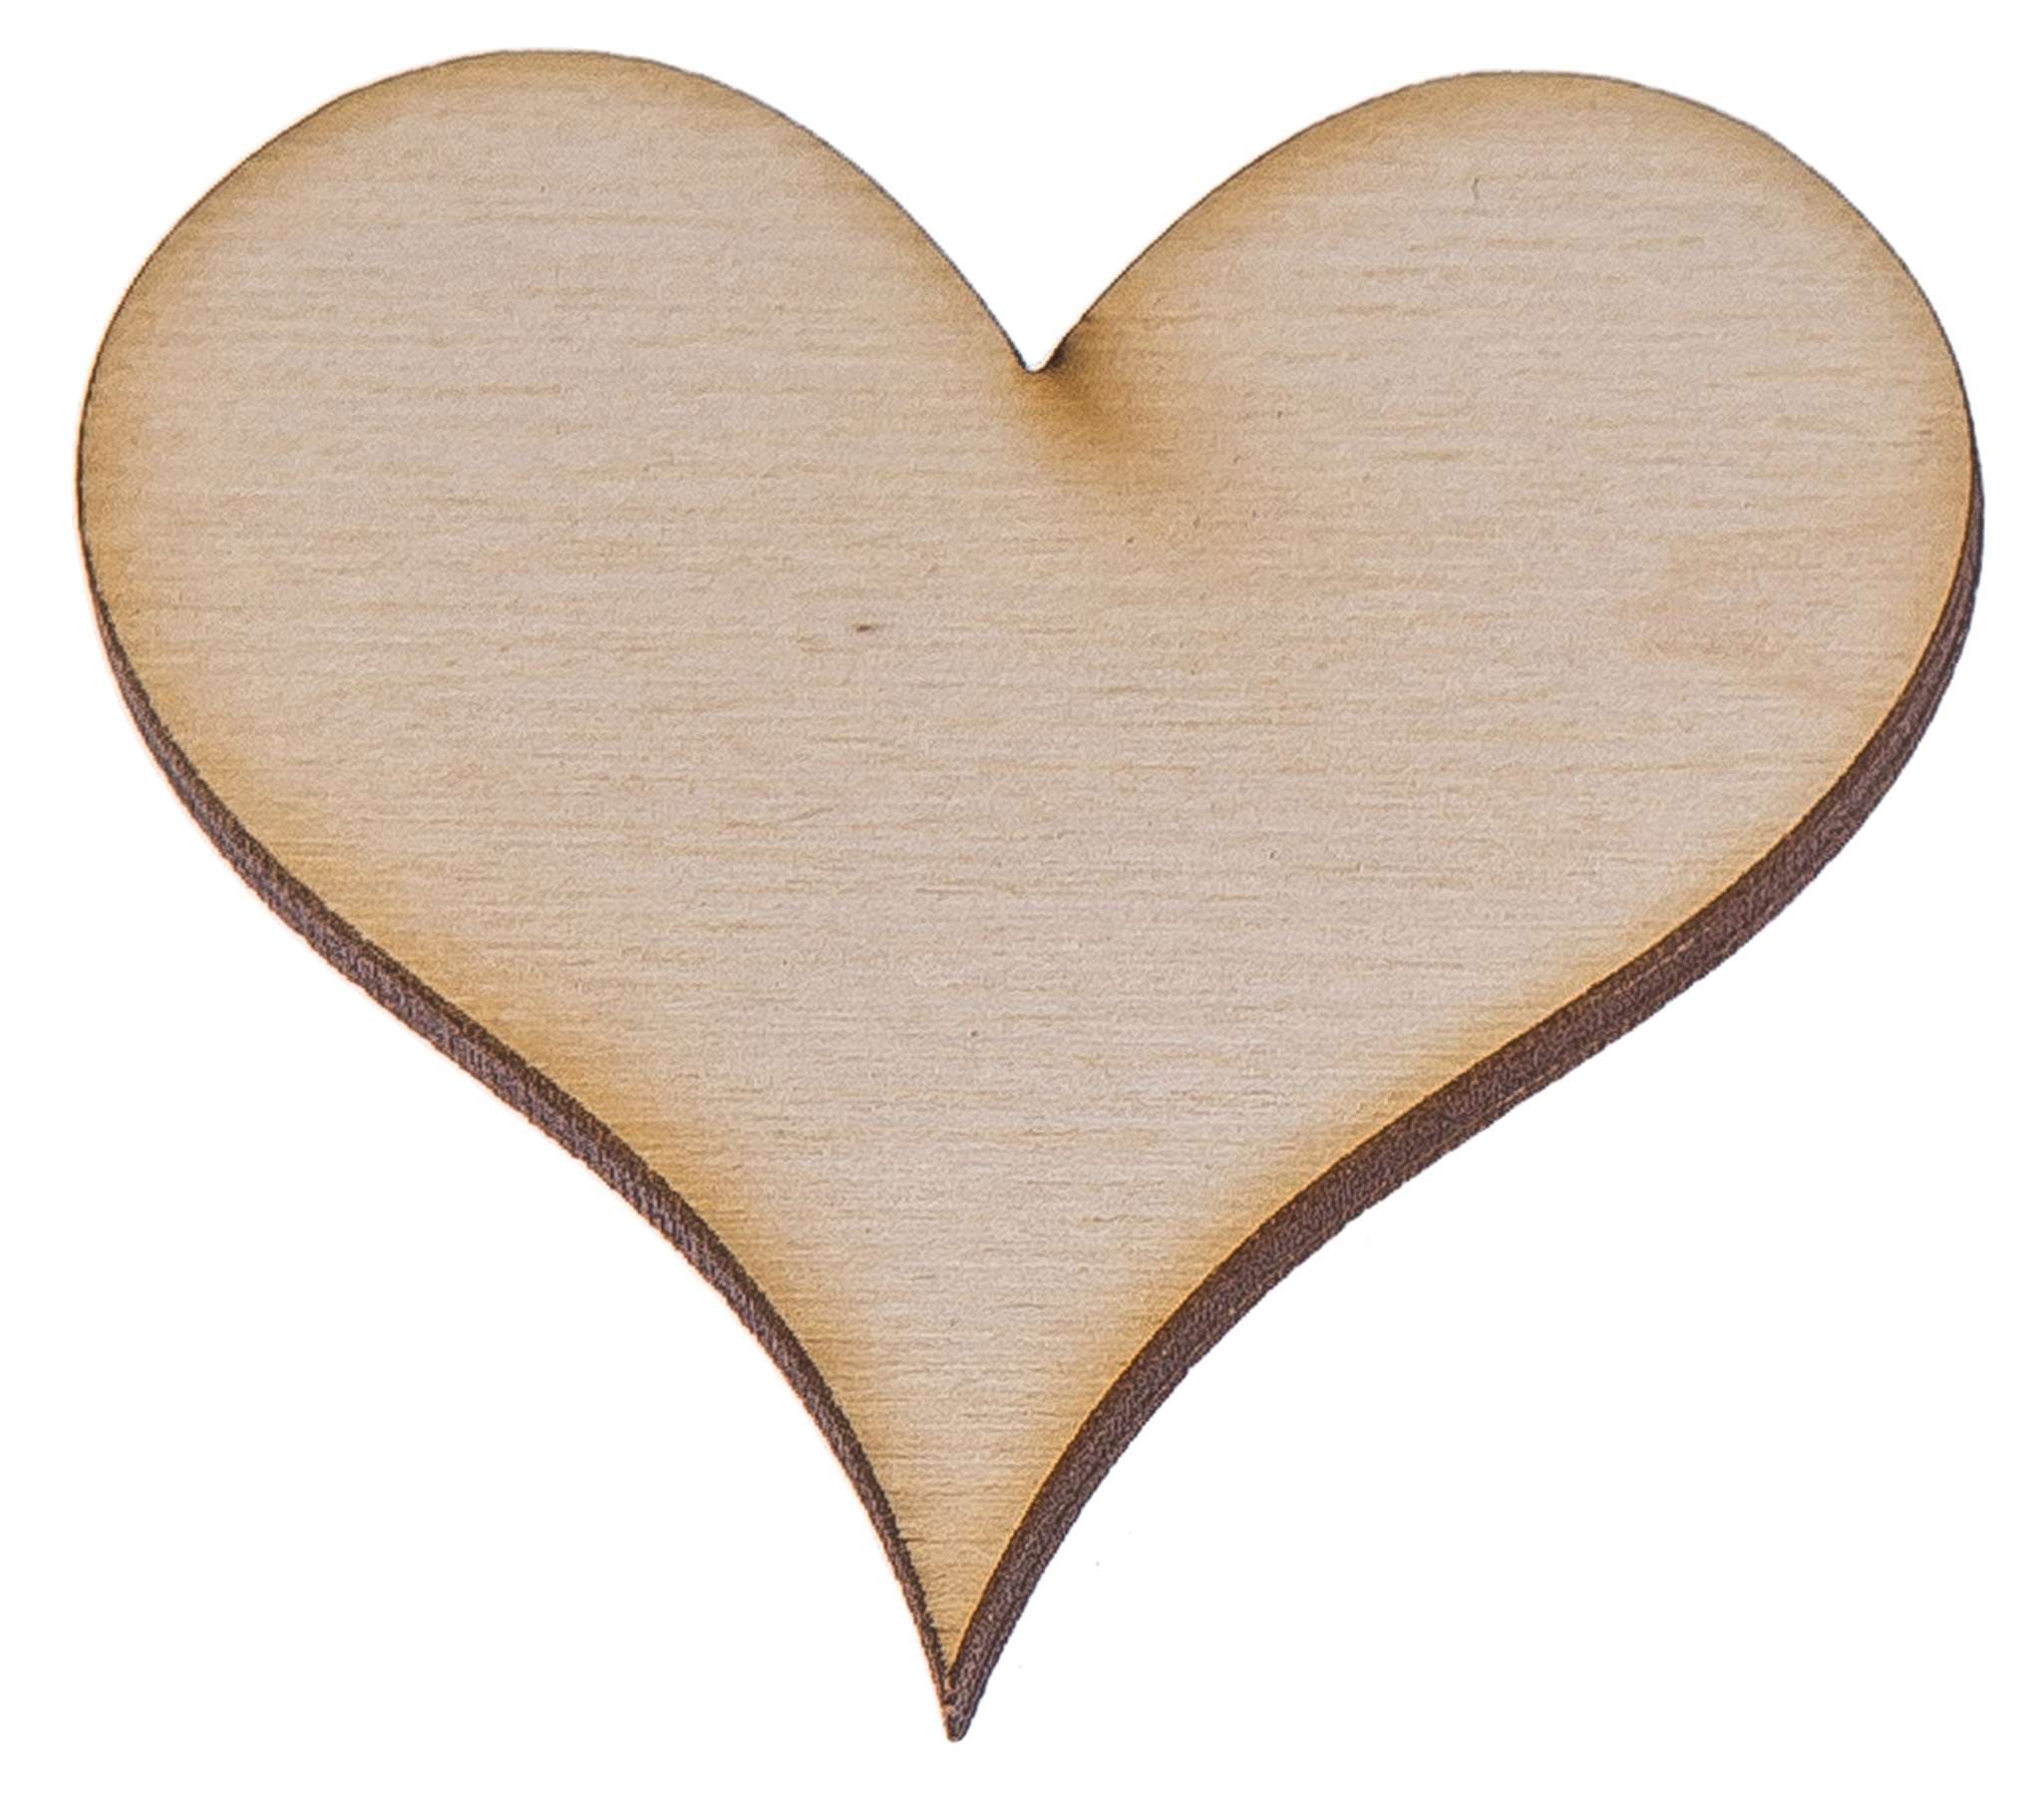 Картинки деревянных сердечек